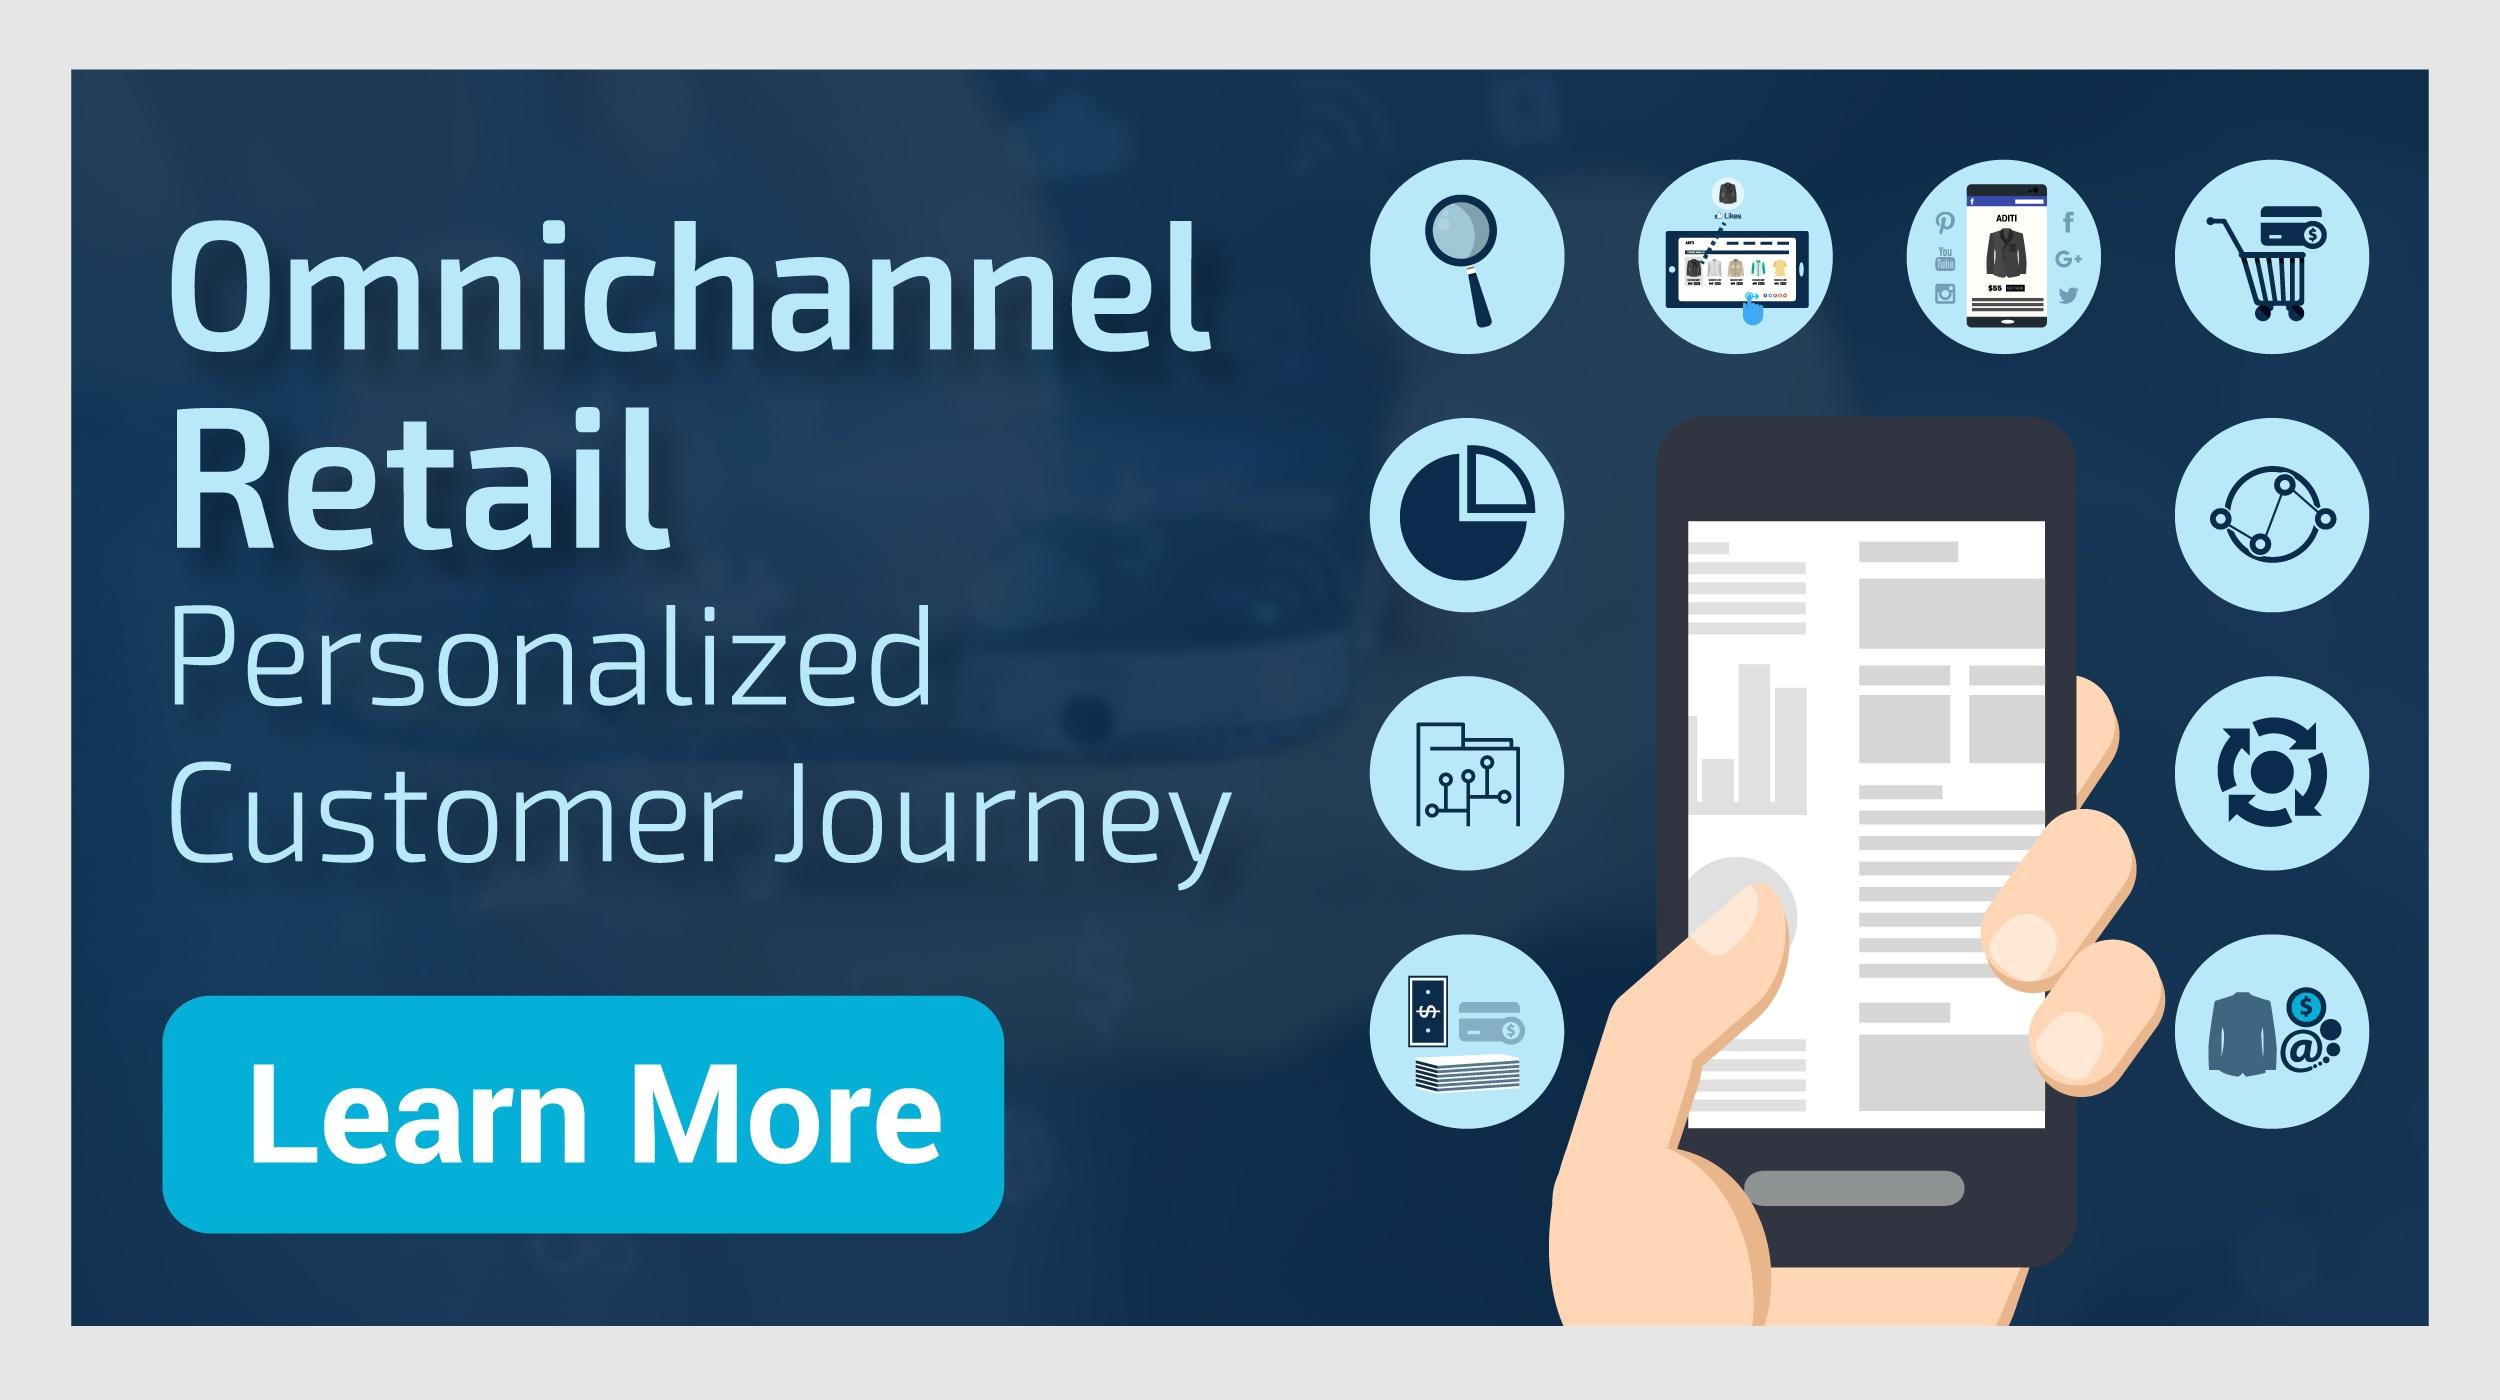 Omnichannel Retail:  Personalized customer journey